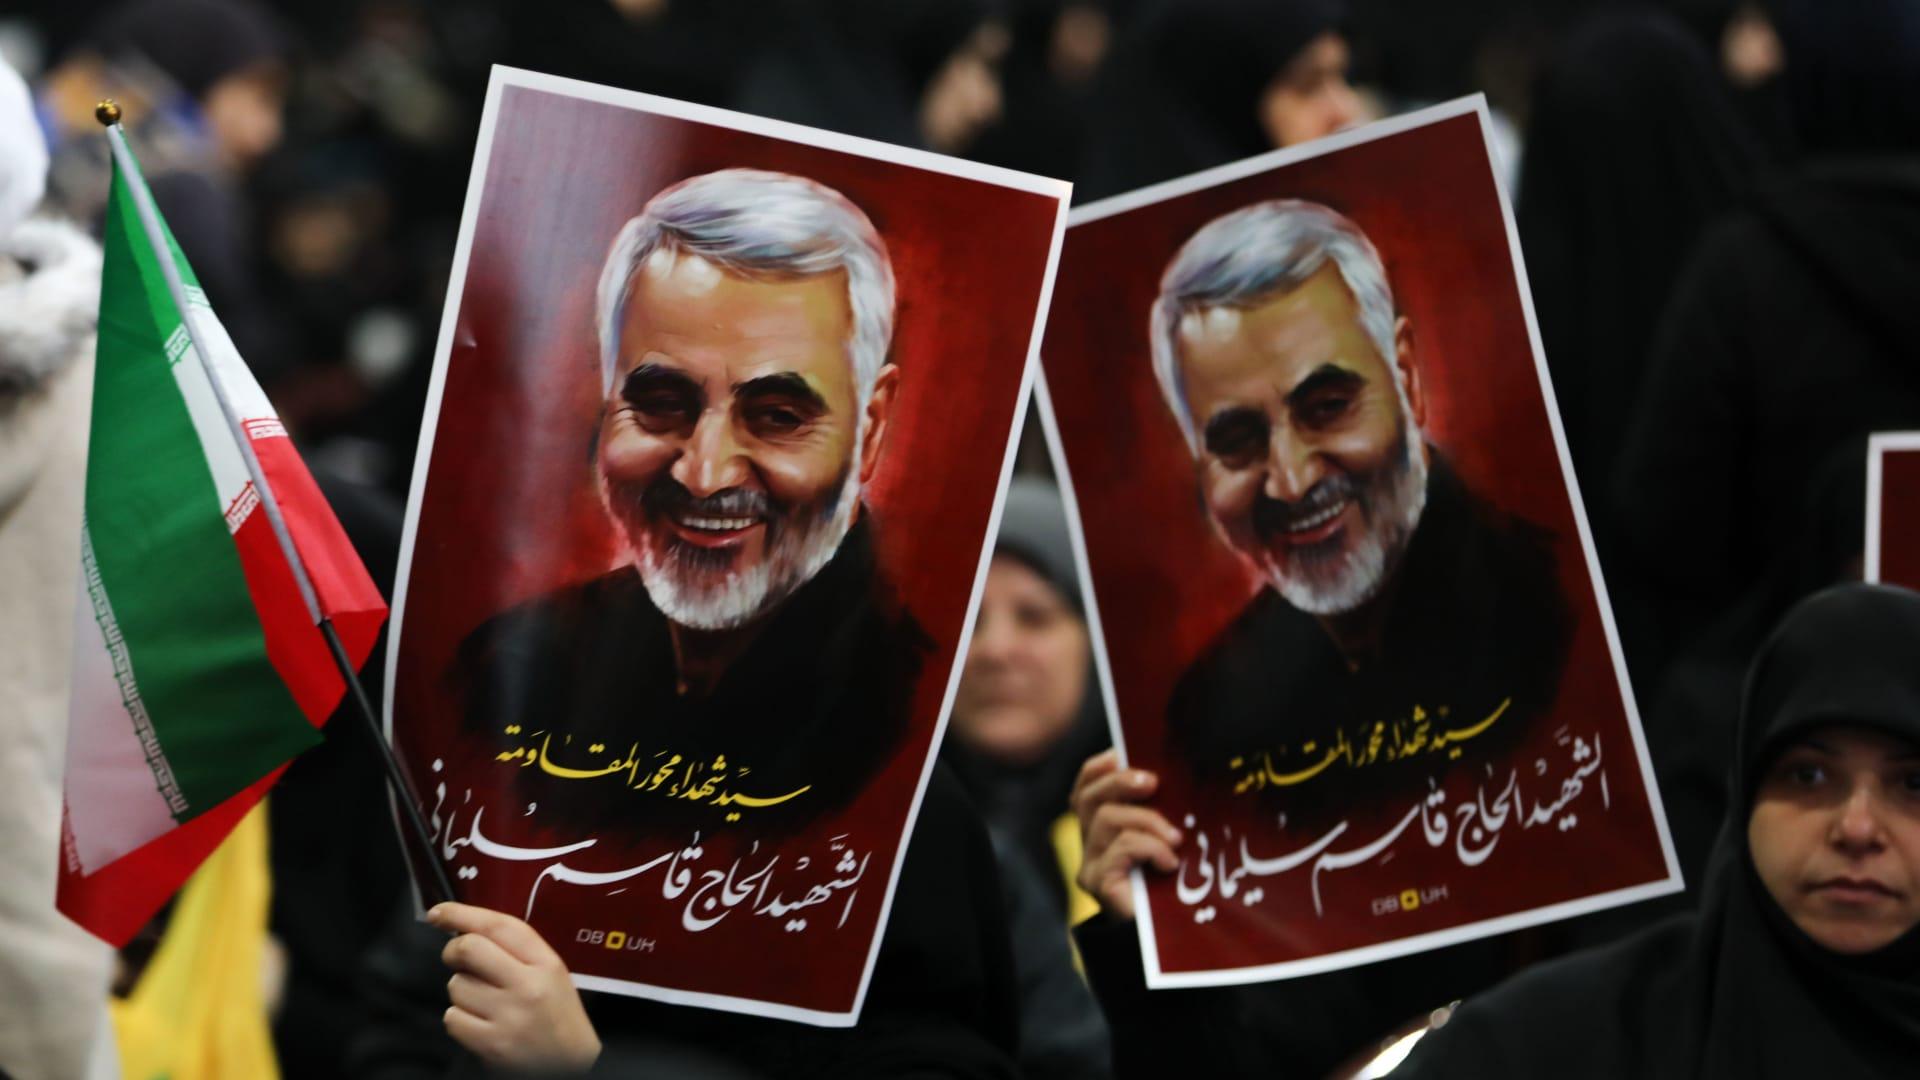 من هو قاسم سليماني ولماذا يشكل موته ضربة لإيران؟